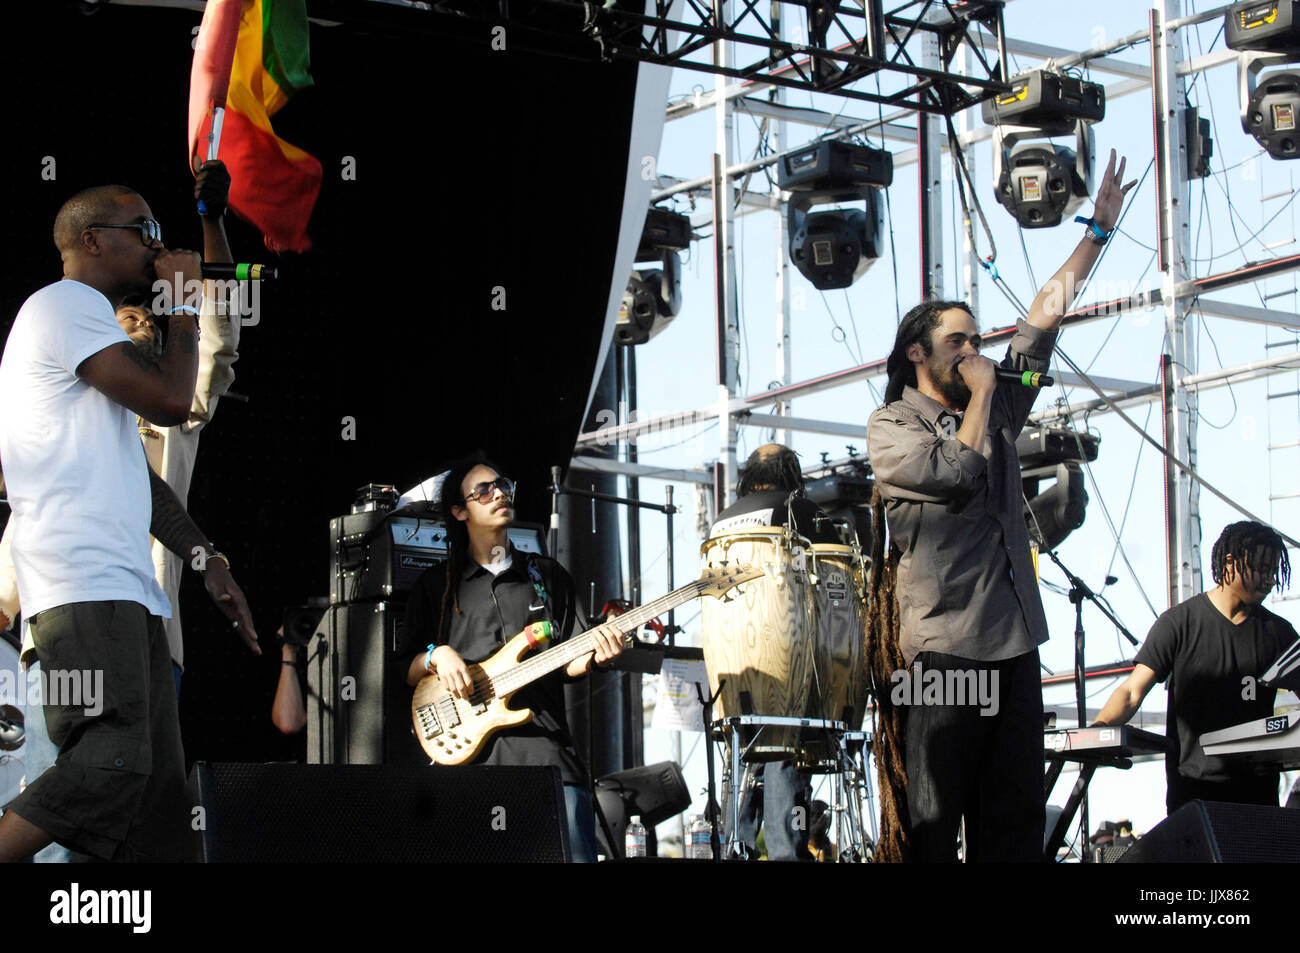 (L-R) Rapper Nas Damian Marley perform 2011 Coachella Music Festival March 17,2011 Indio. - Stock Image